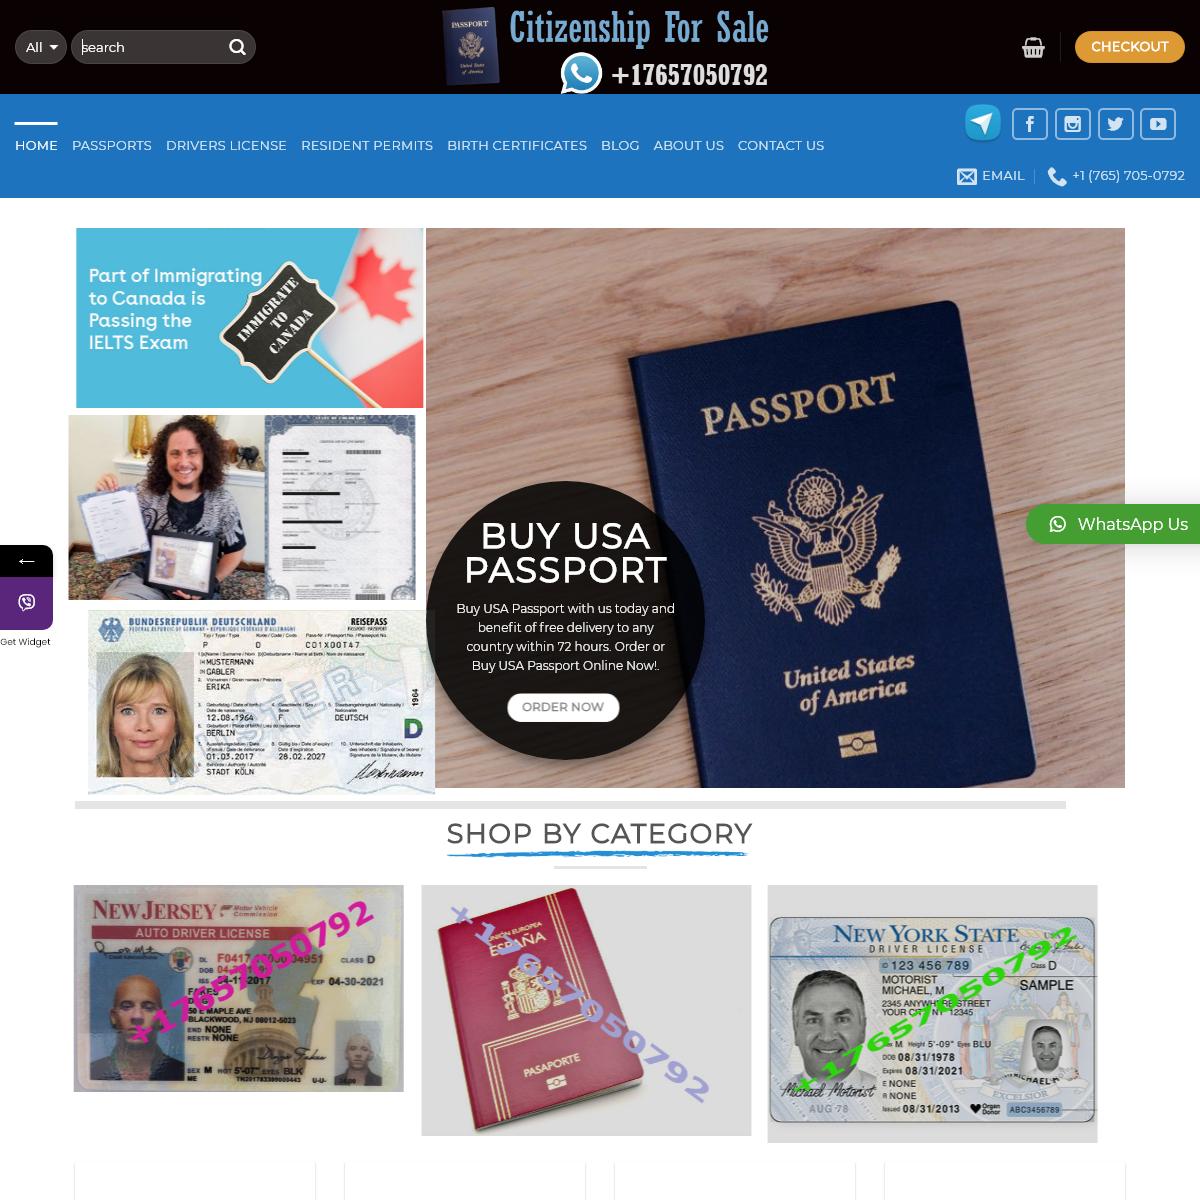 Real Passports for Sale - British, Canada Passports, UK passports for Sale